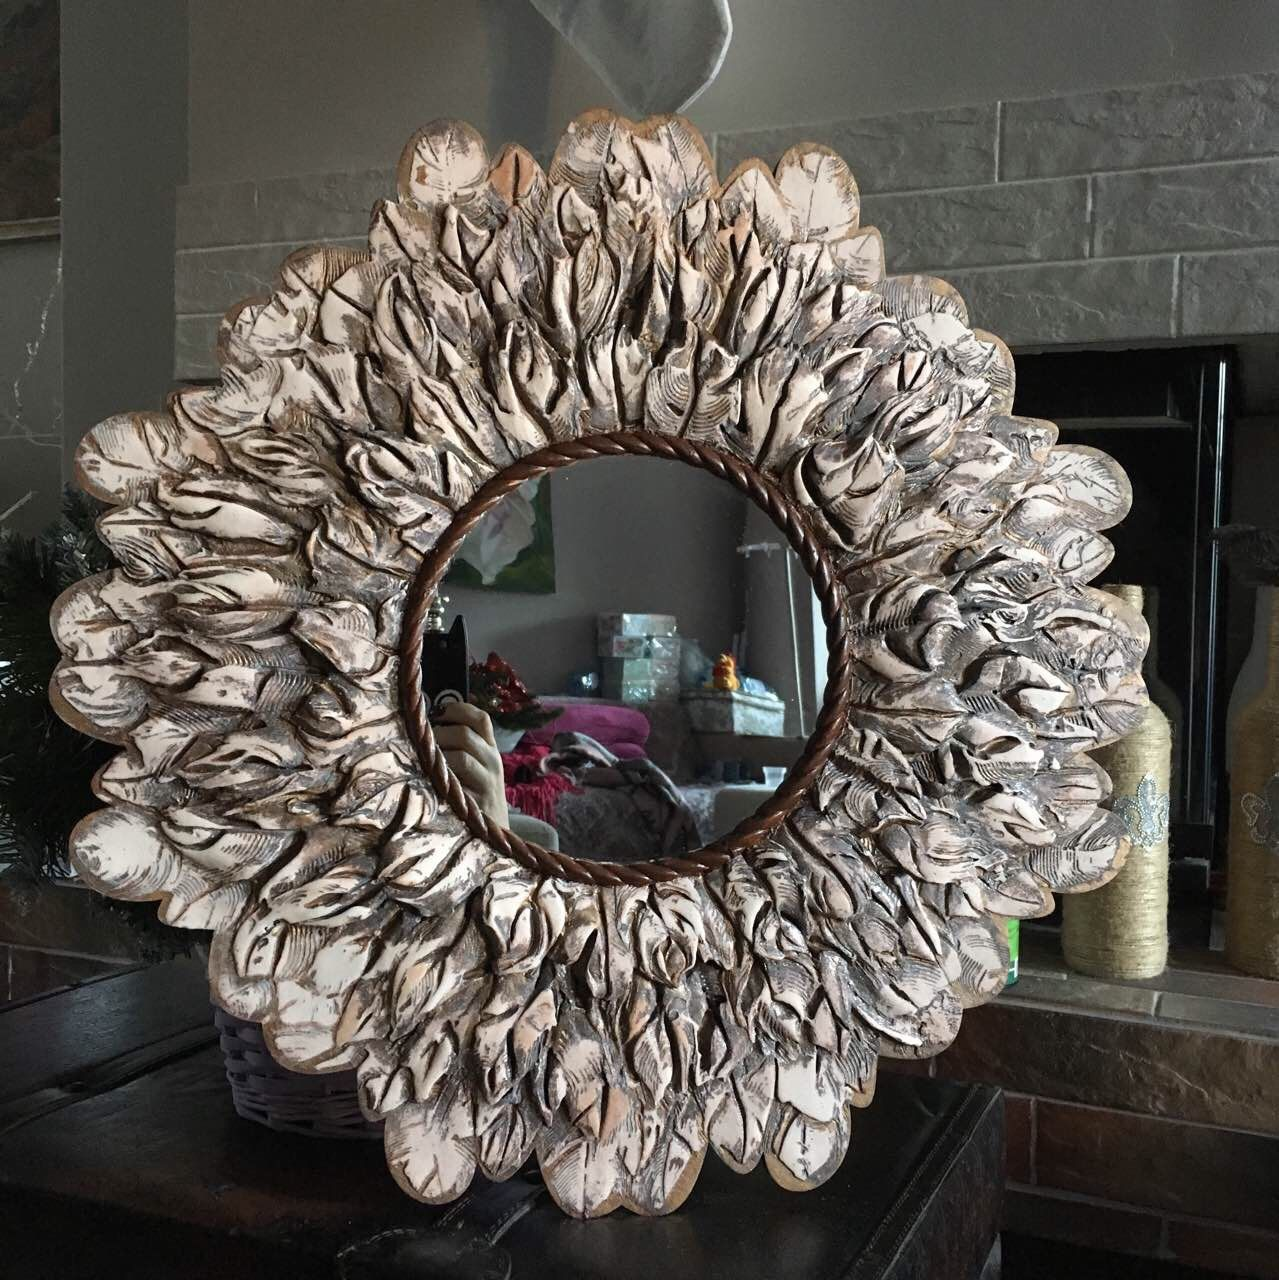 creative handmade mirrors - HD1279×1280